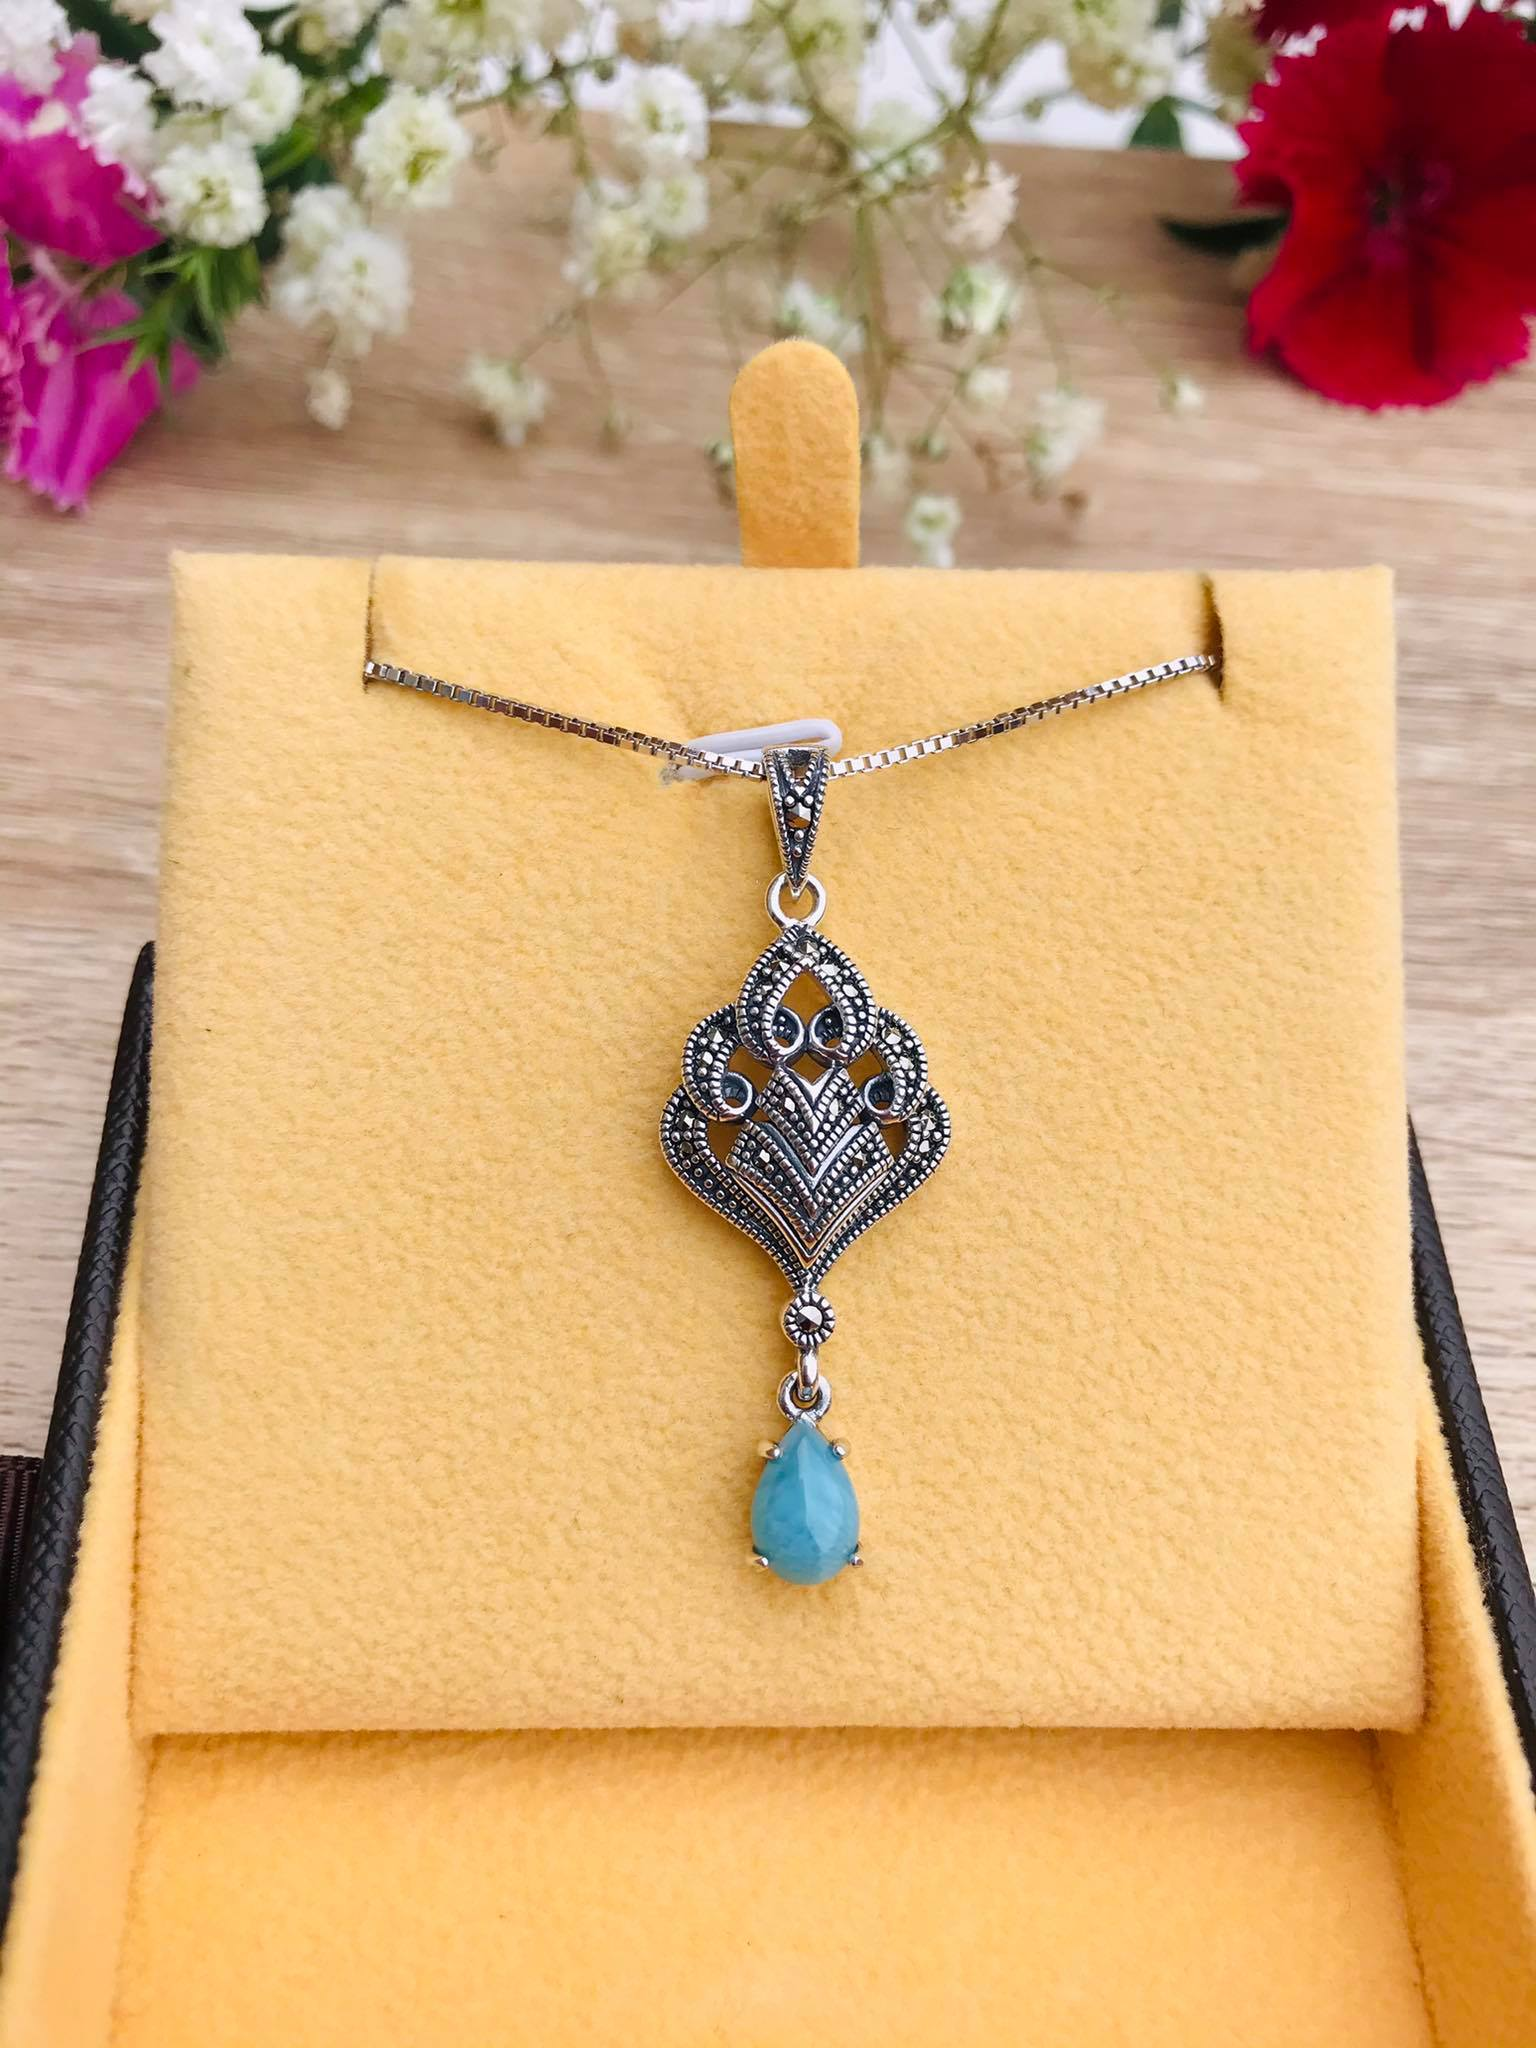 Larimar & Marcasite set in Silver Necklace Image